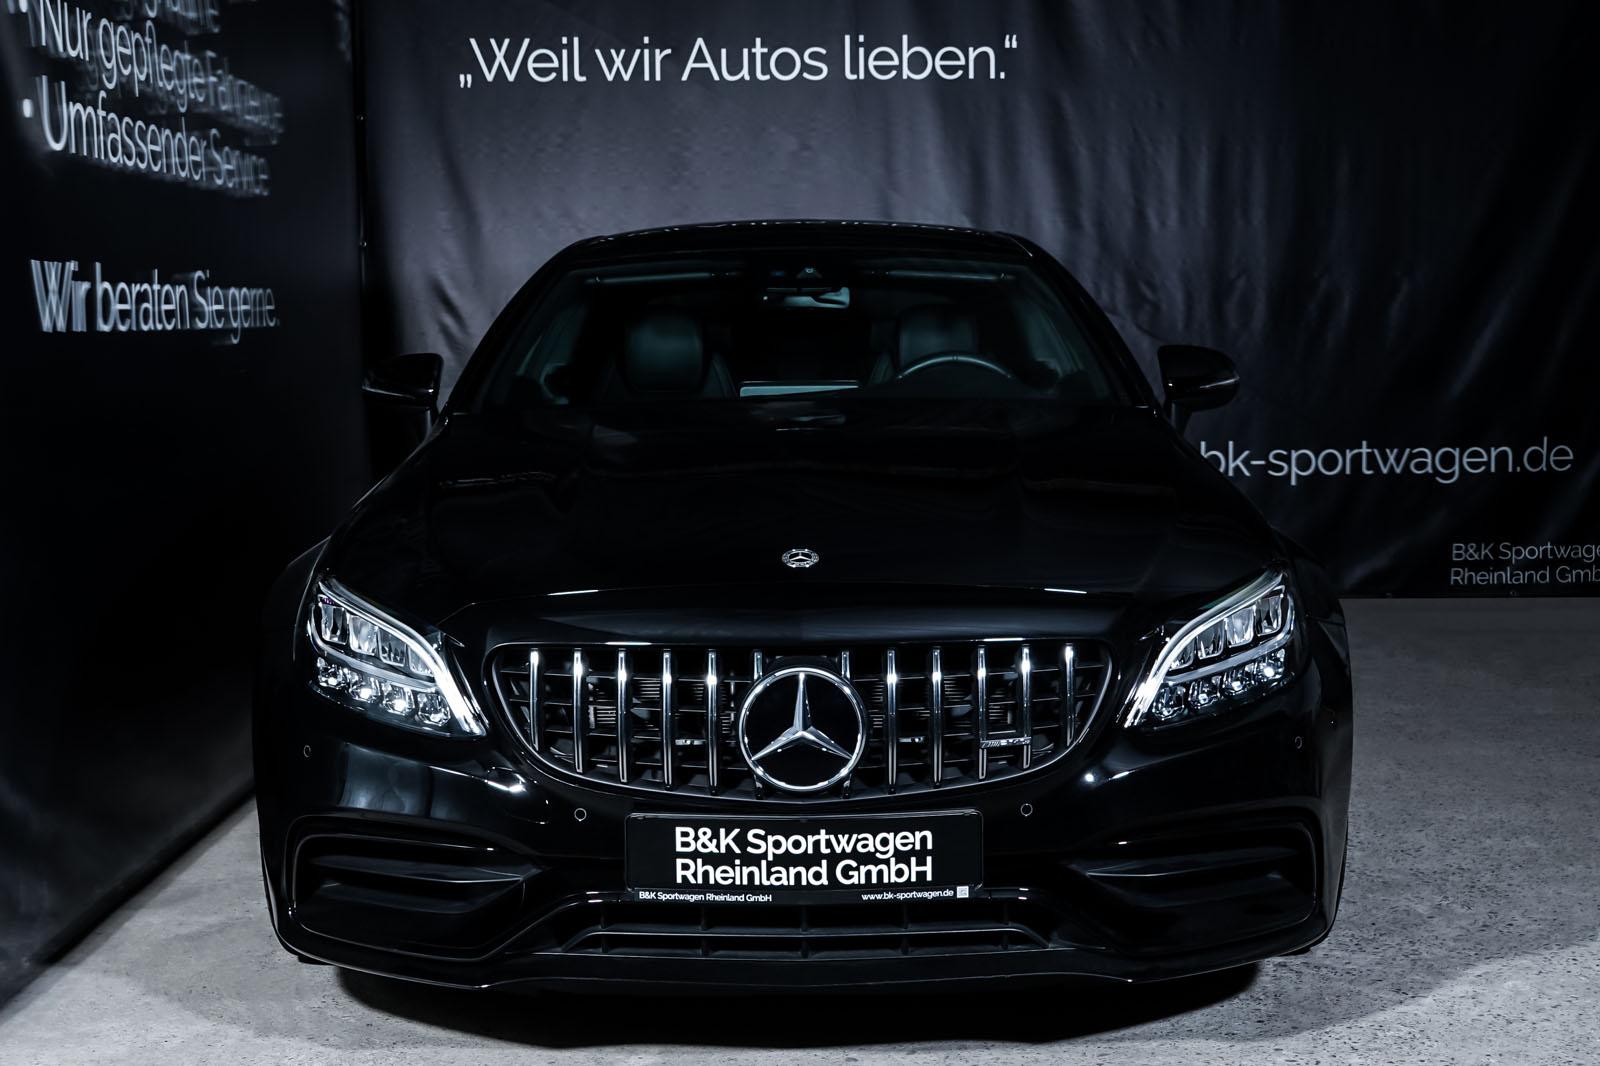 MercedesBenz_C63_AMG_Schwarz_Schwarz_MB-5973_1_w